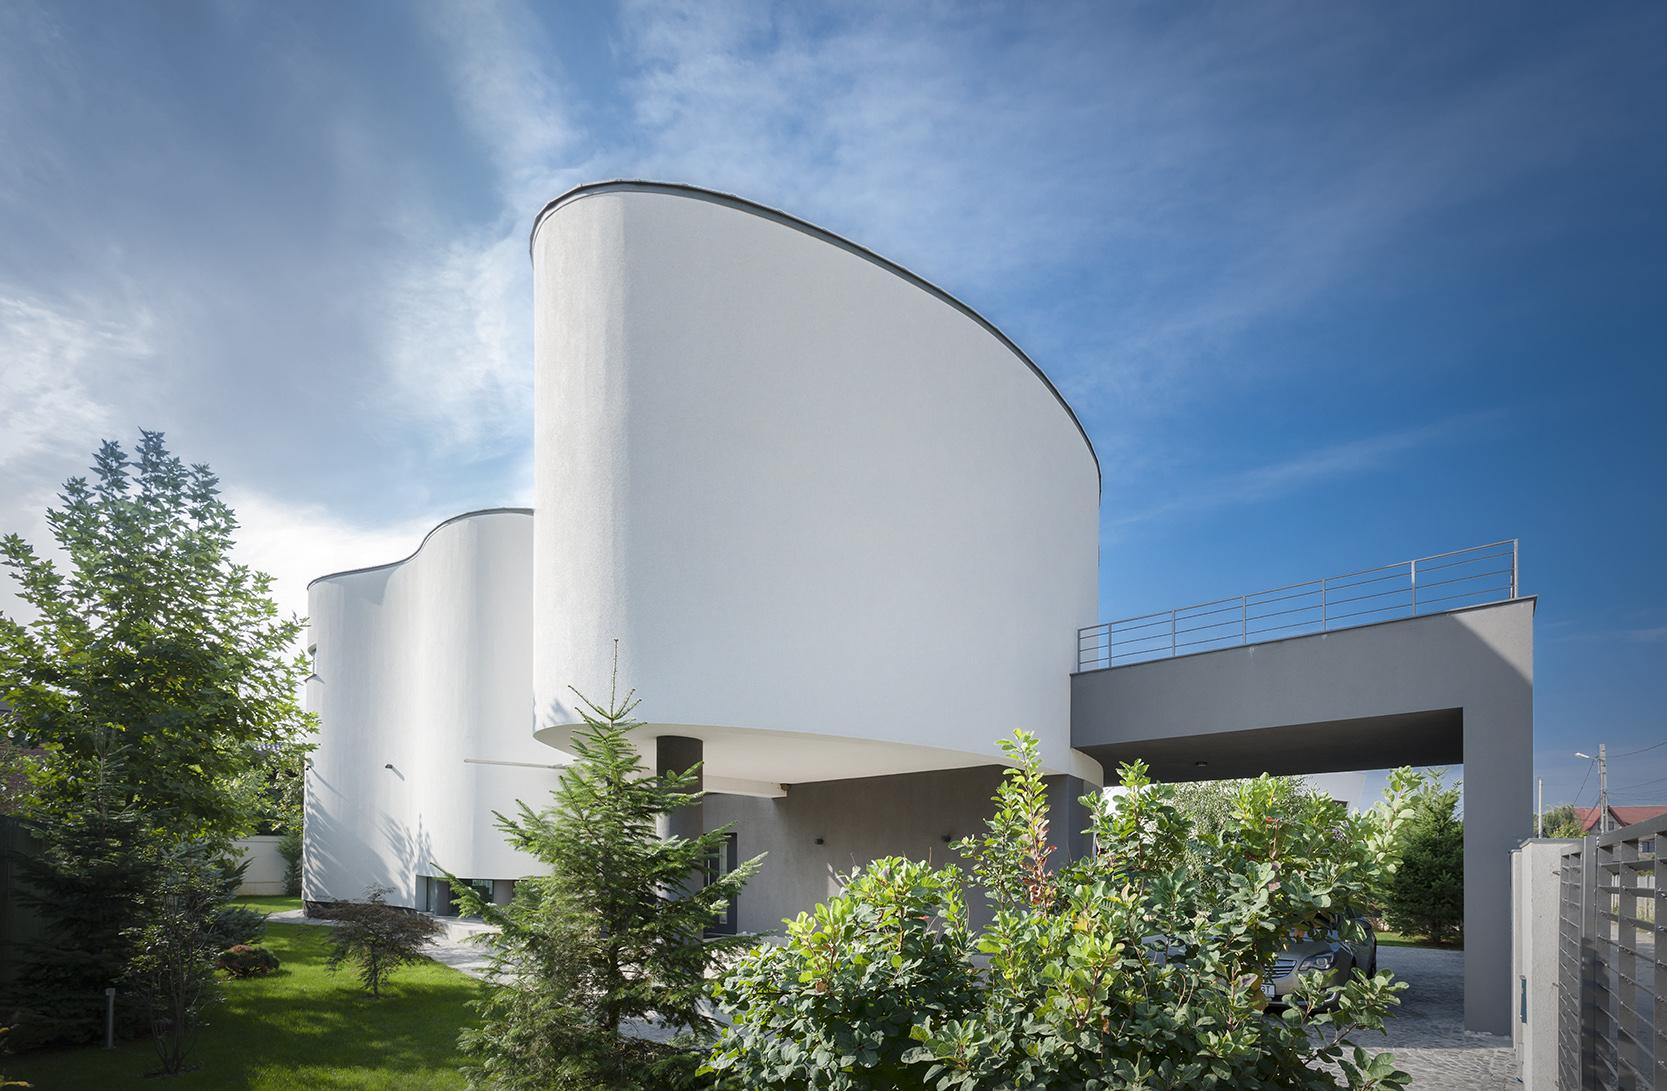 https://nbc-arhitect.ro/wp-content/uploads/2020/10/NBC-Arhitect-_-residences-_-Serban-House-Villa-_-Romania-_-exterior-view_19.jpg